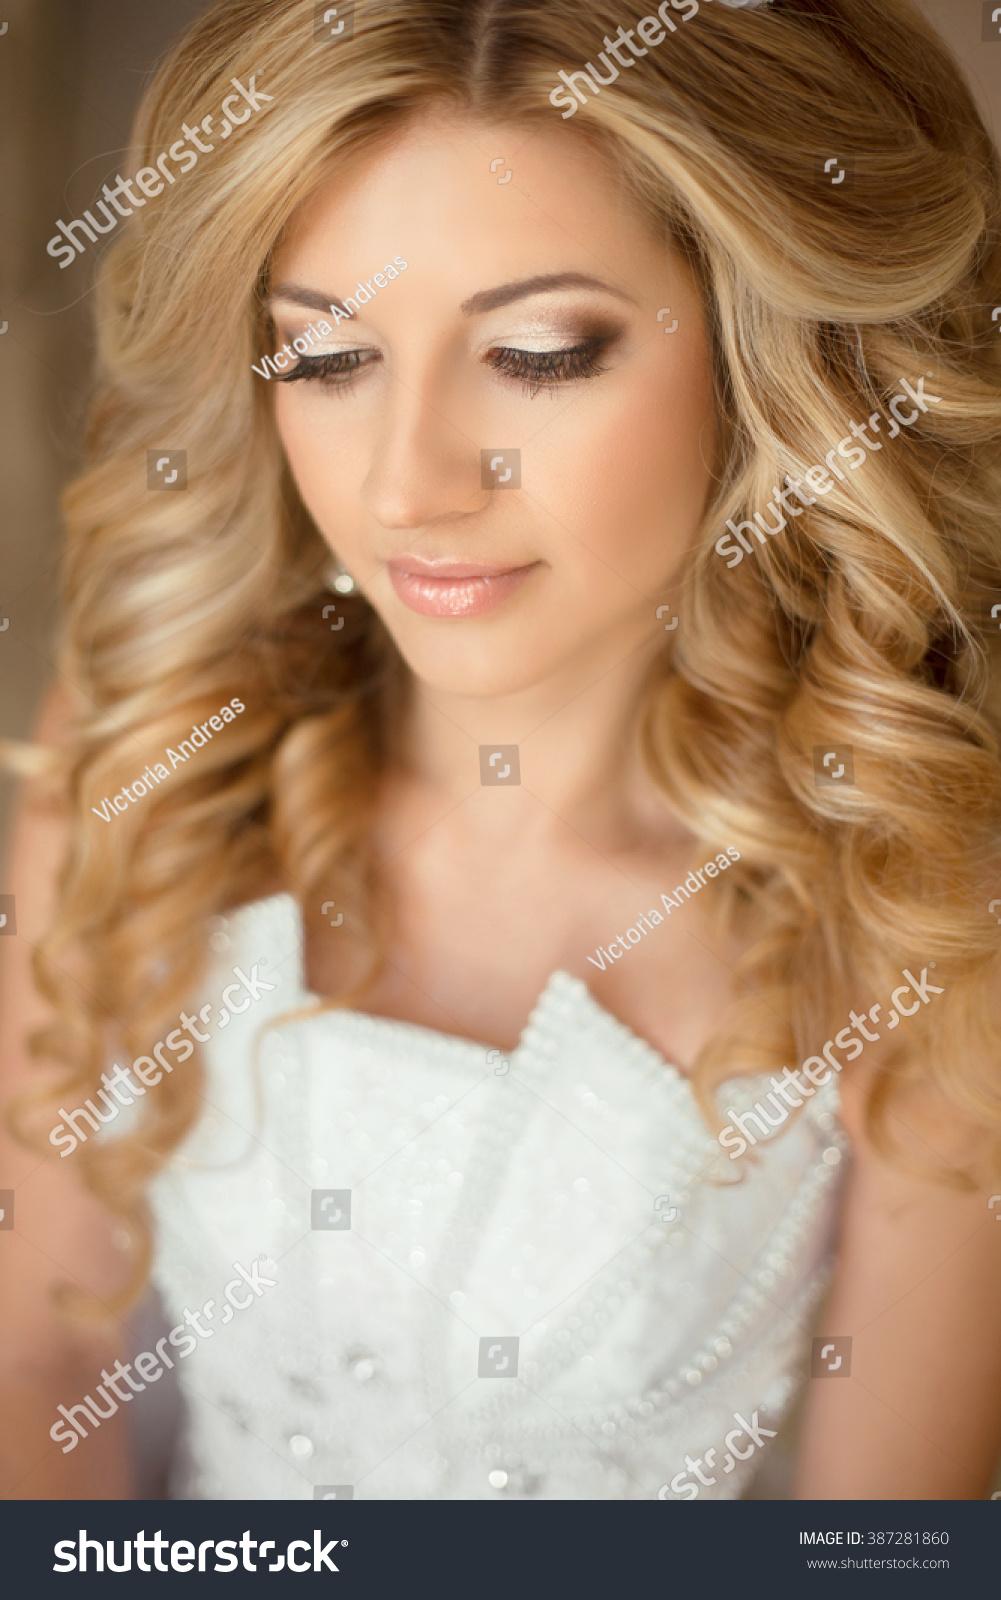 Bride Eye Makeup Wedding Hairstyle Beautiful Royalty Free Stock